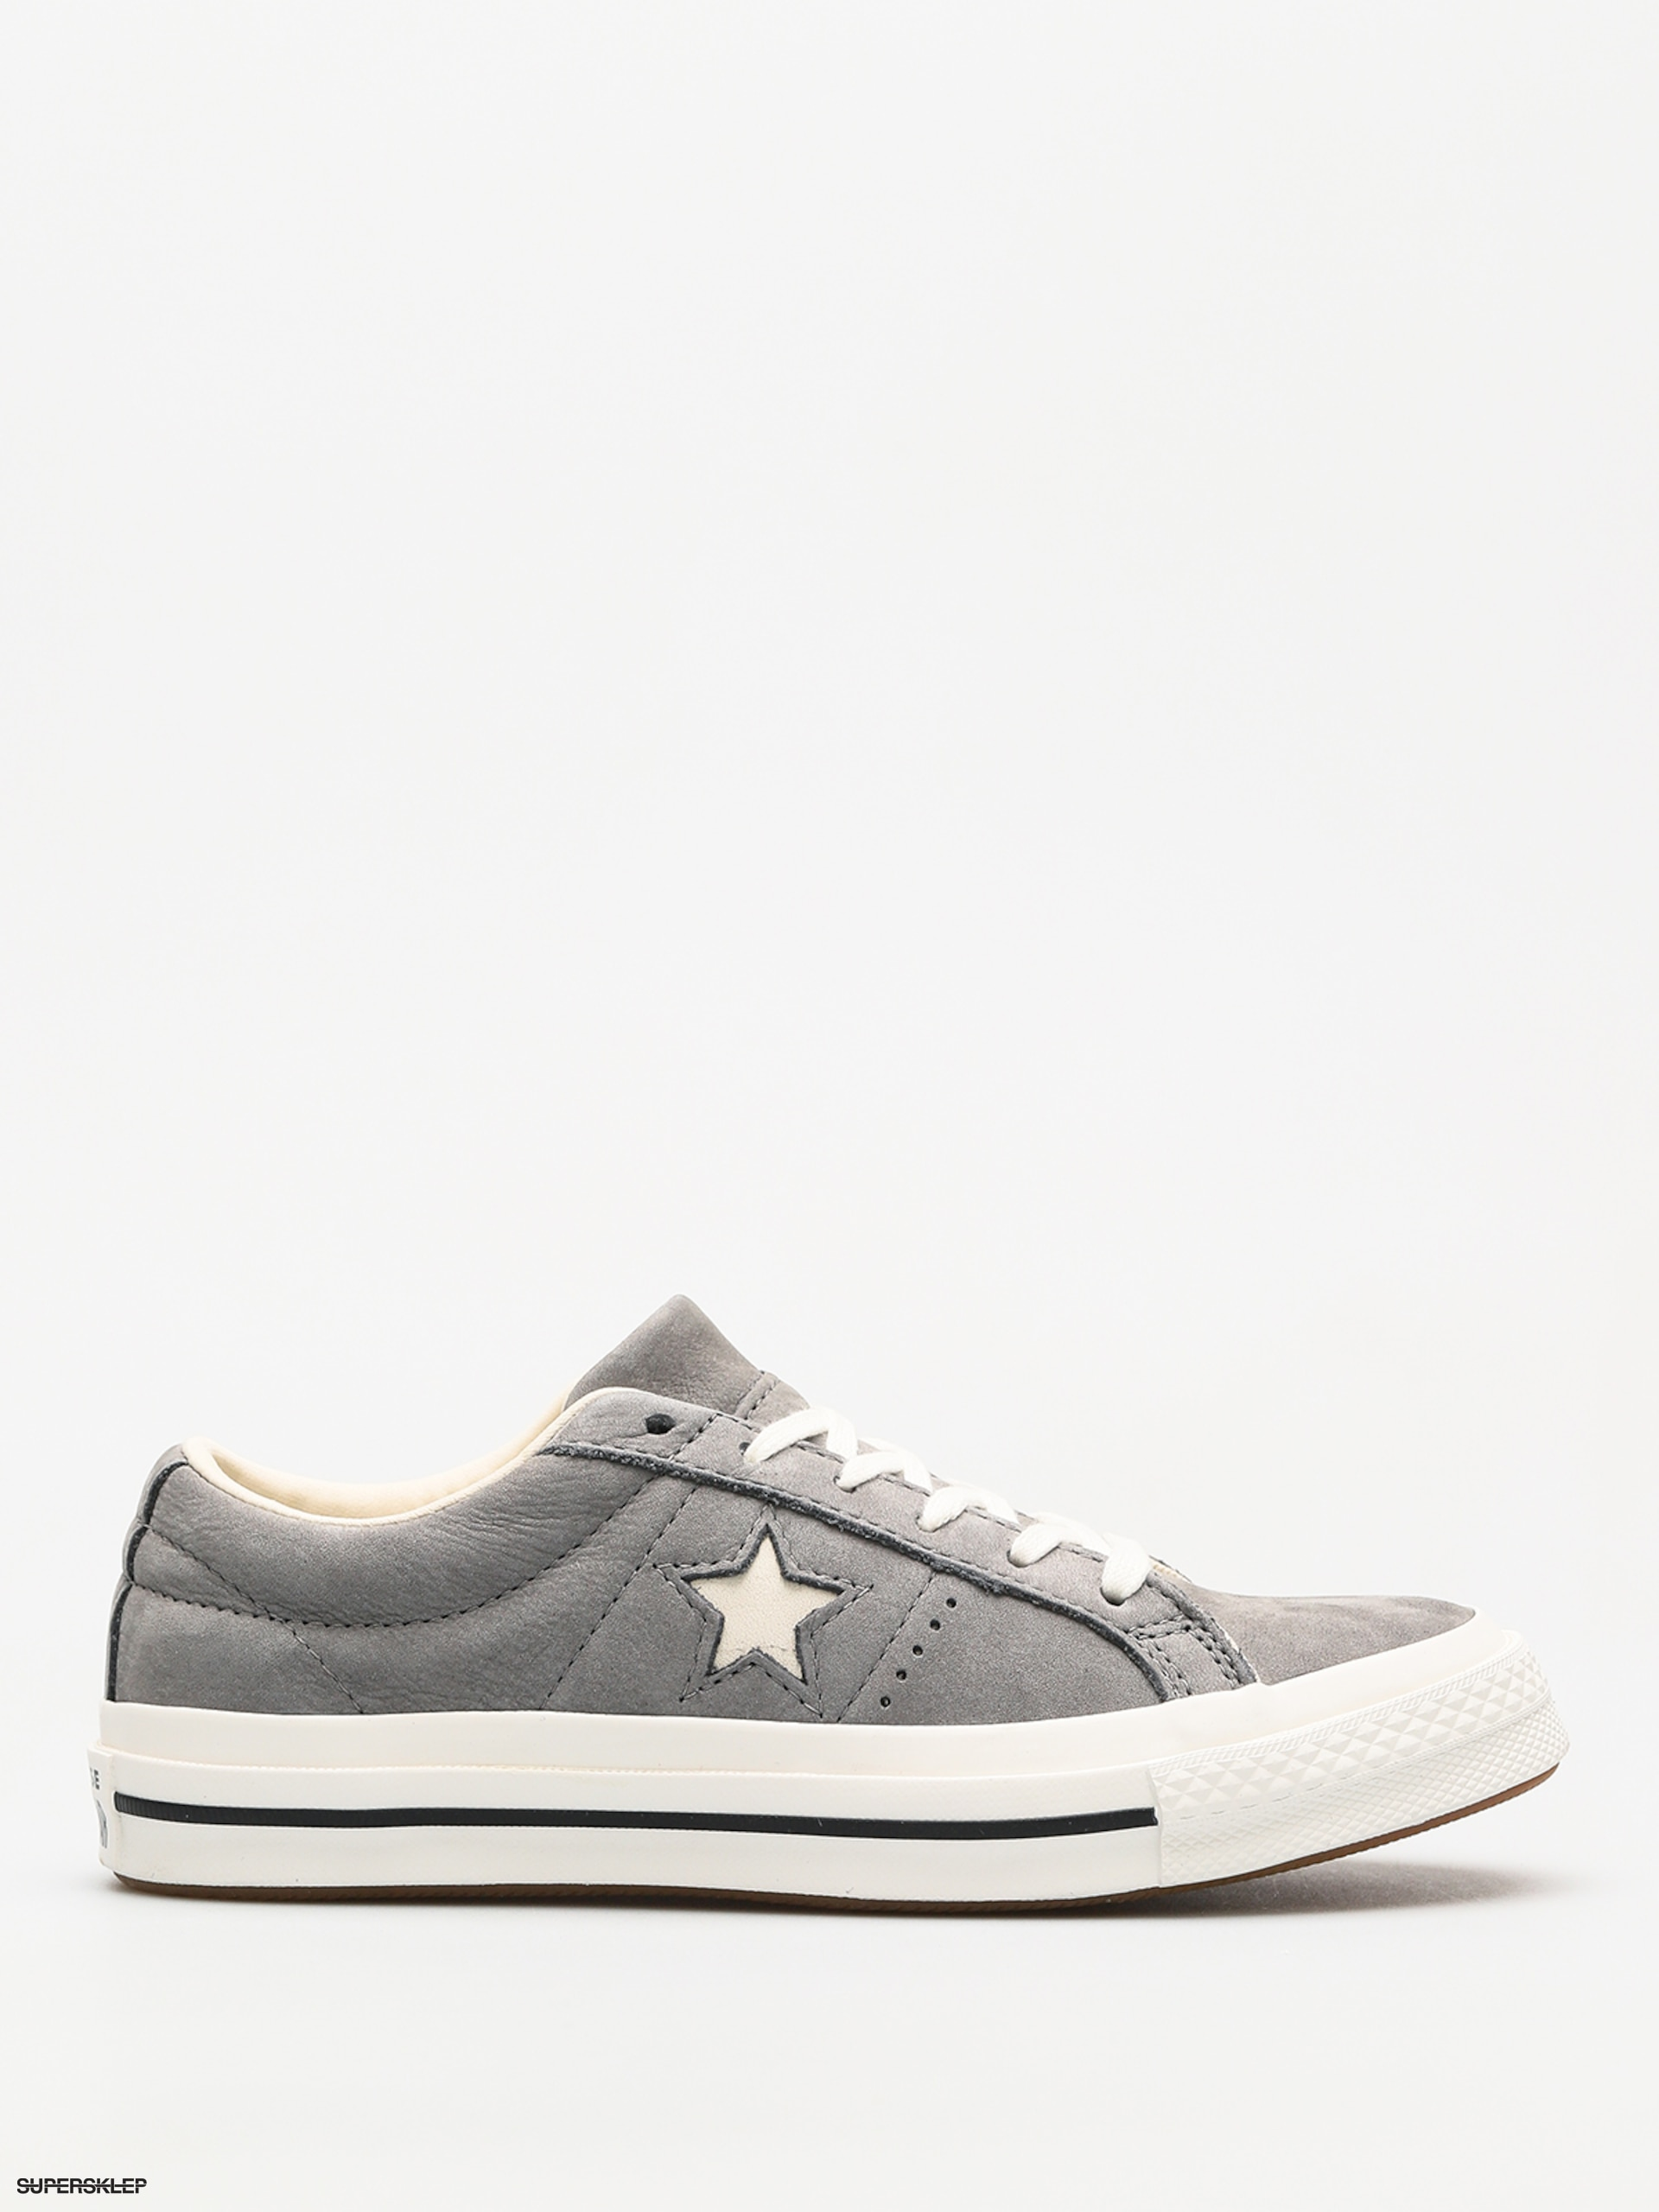 Trampki Converse One Star Ox (masonblackvintage white)